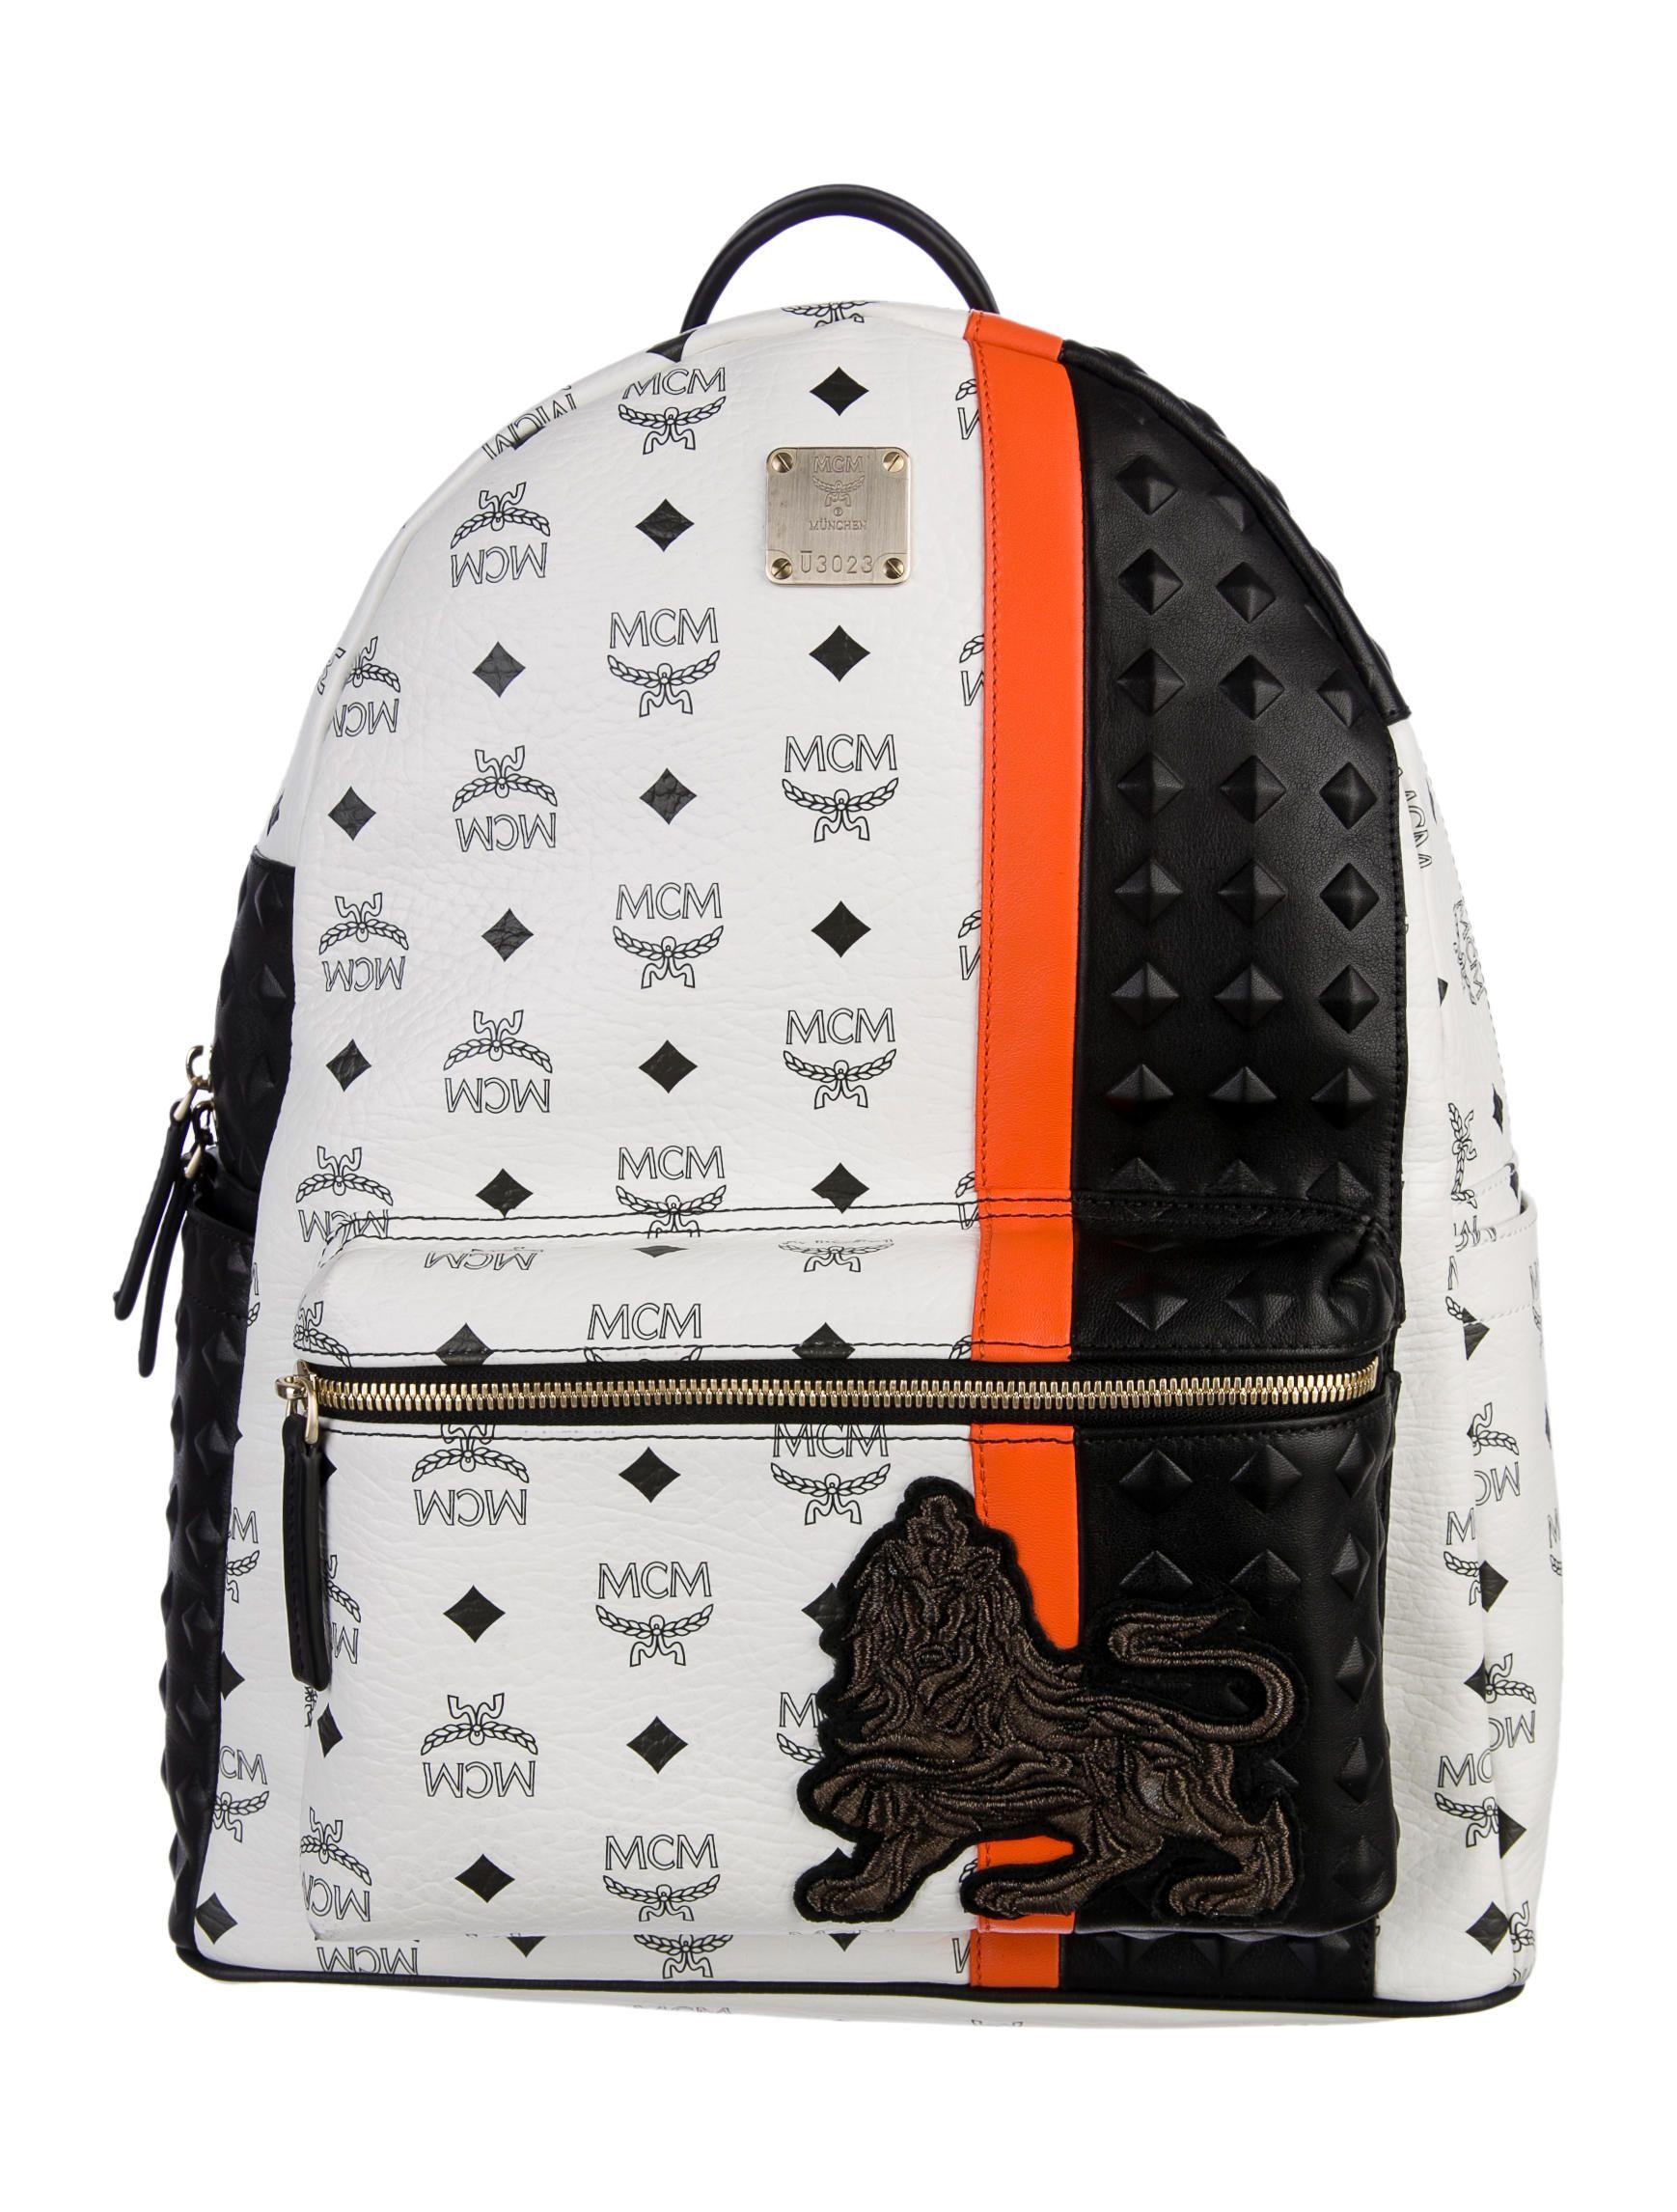 b67523fc76e MCM Munich Lion Backpack w  Tags - Bags - W3020049